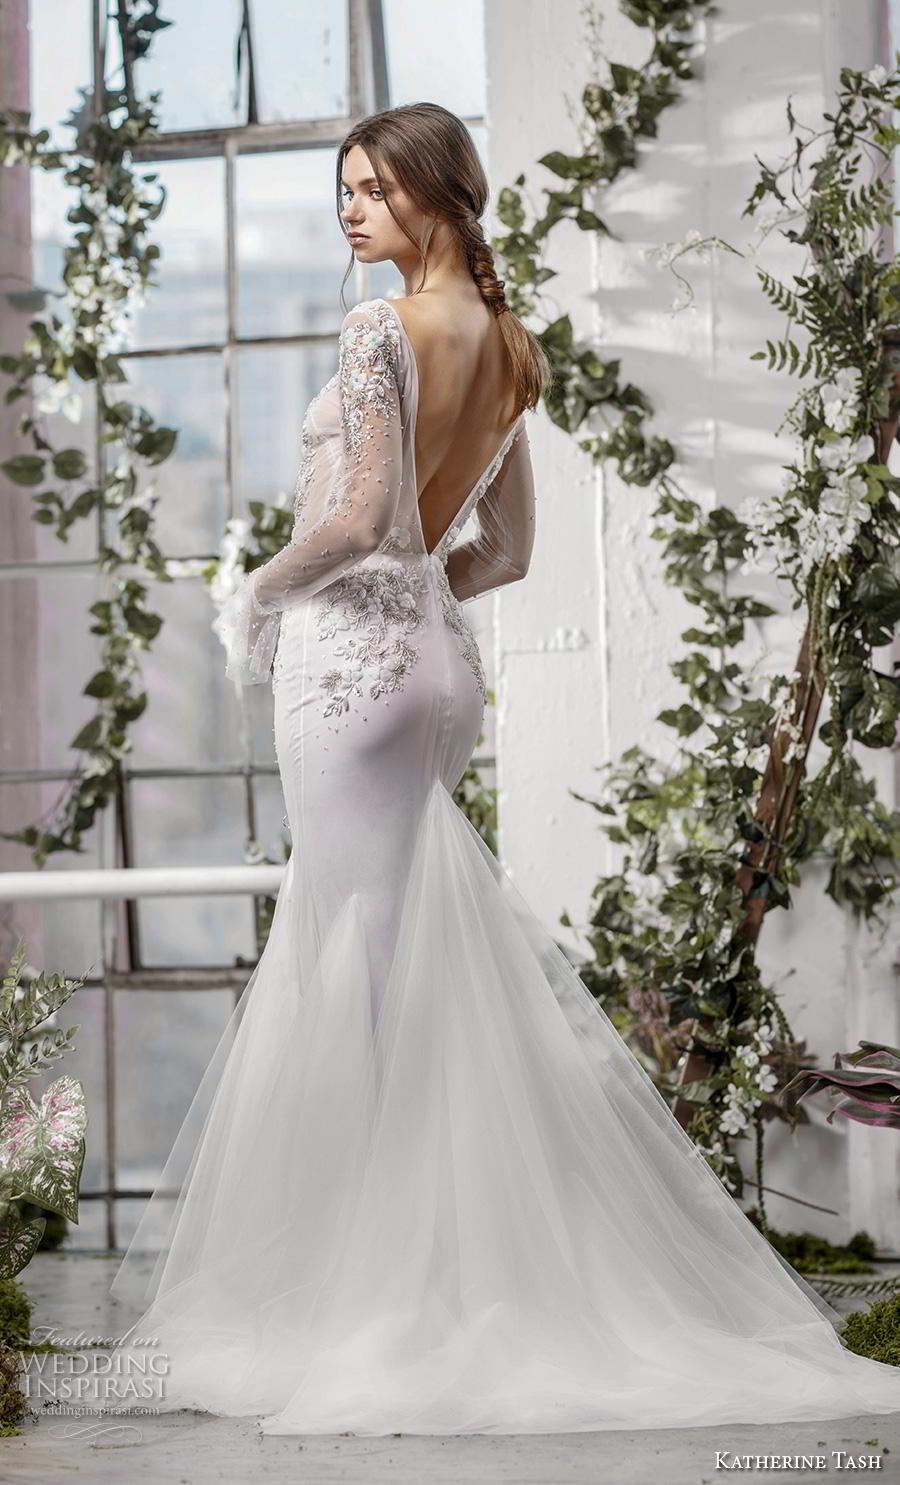 katherine tash fall 2019 bridal long poet sleeves bateau neckline heavily embellished sheer bodice elegant mermaid wedding dress backless v back medium train (5) bv